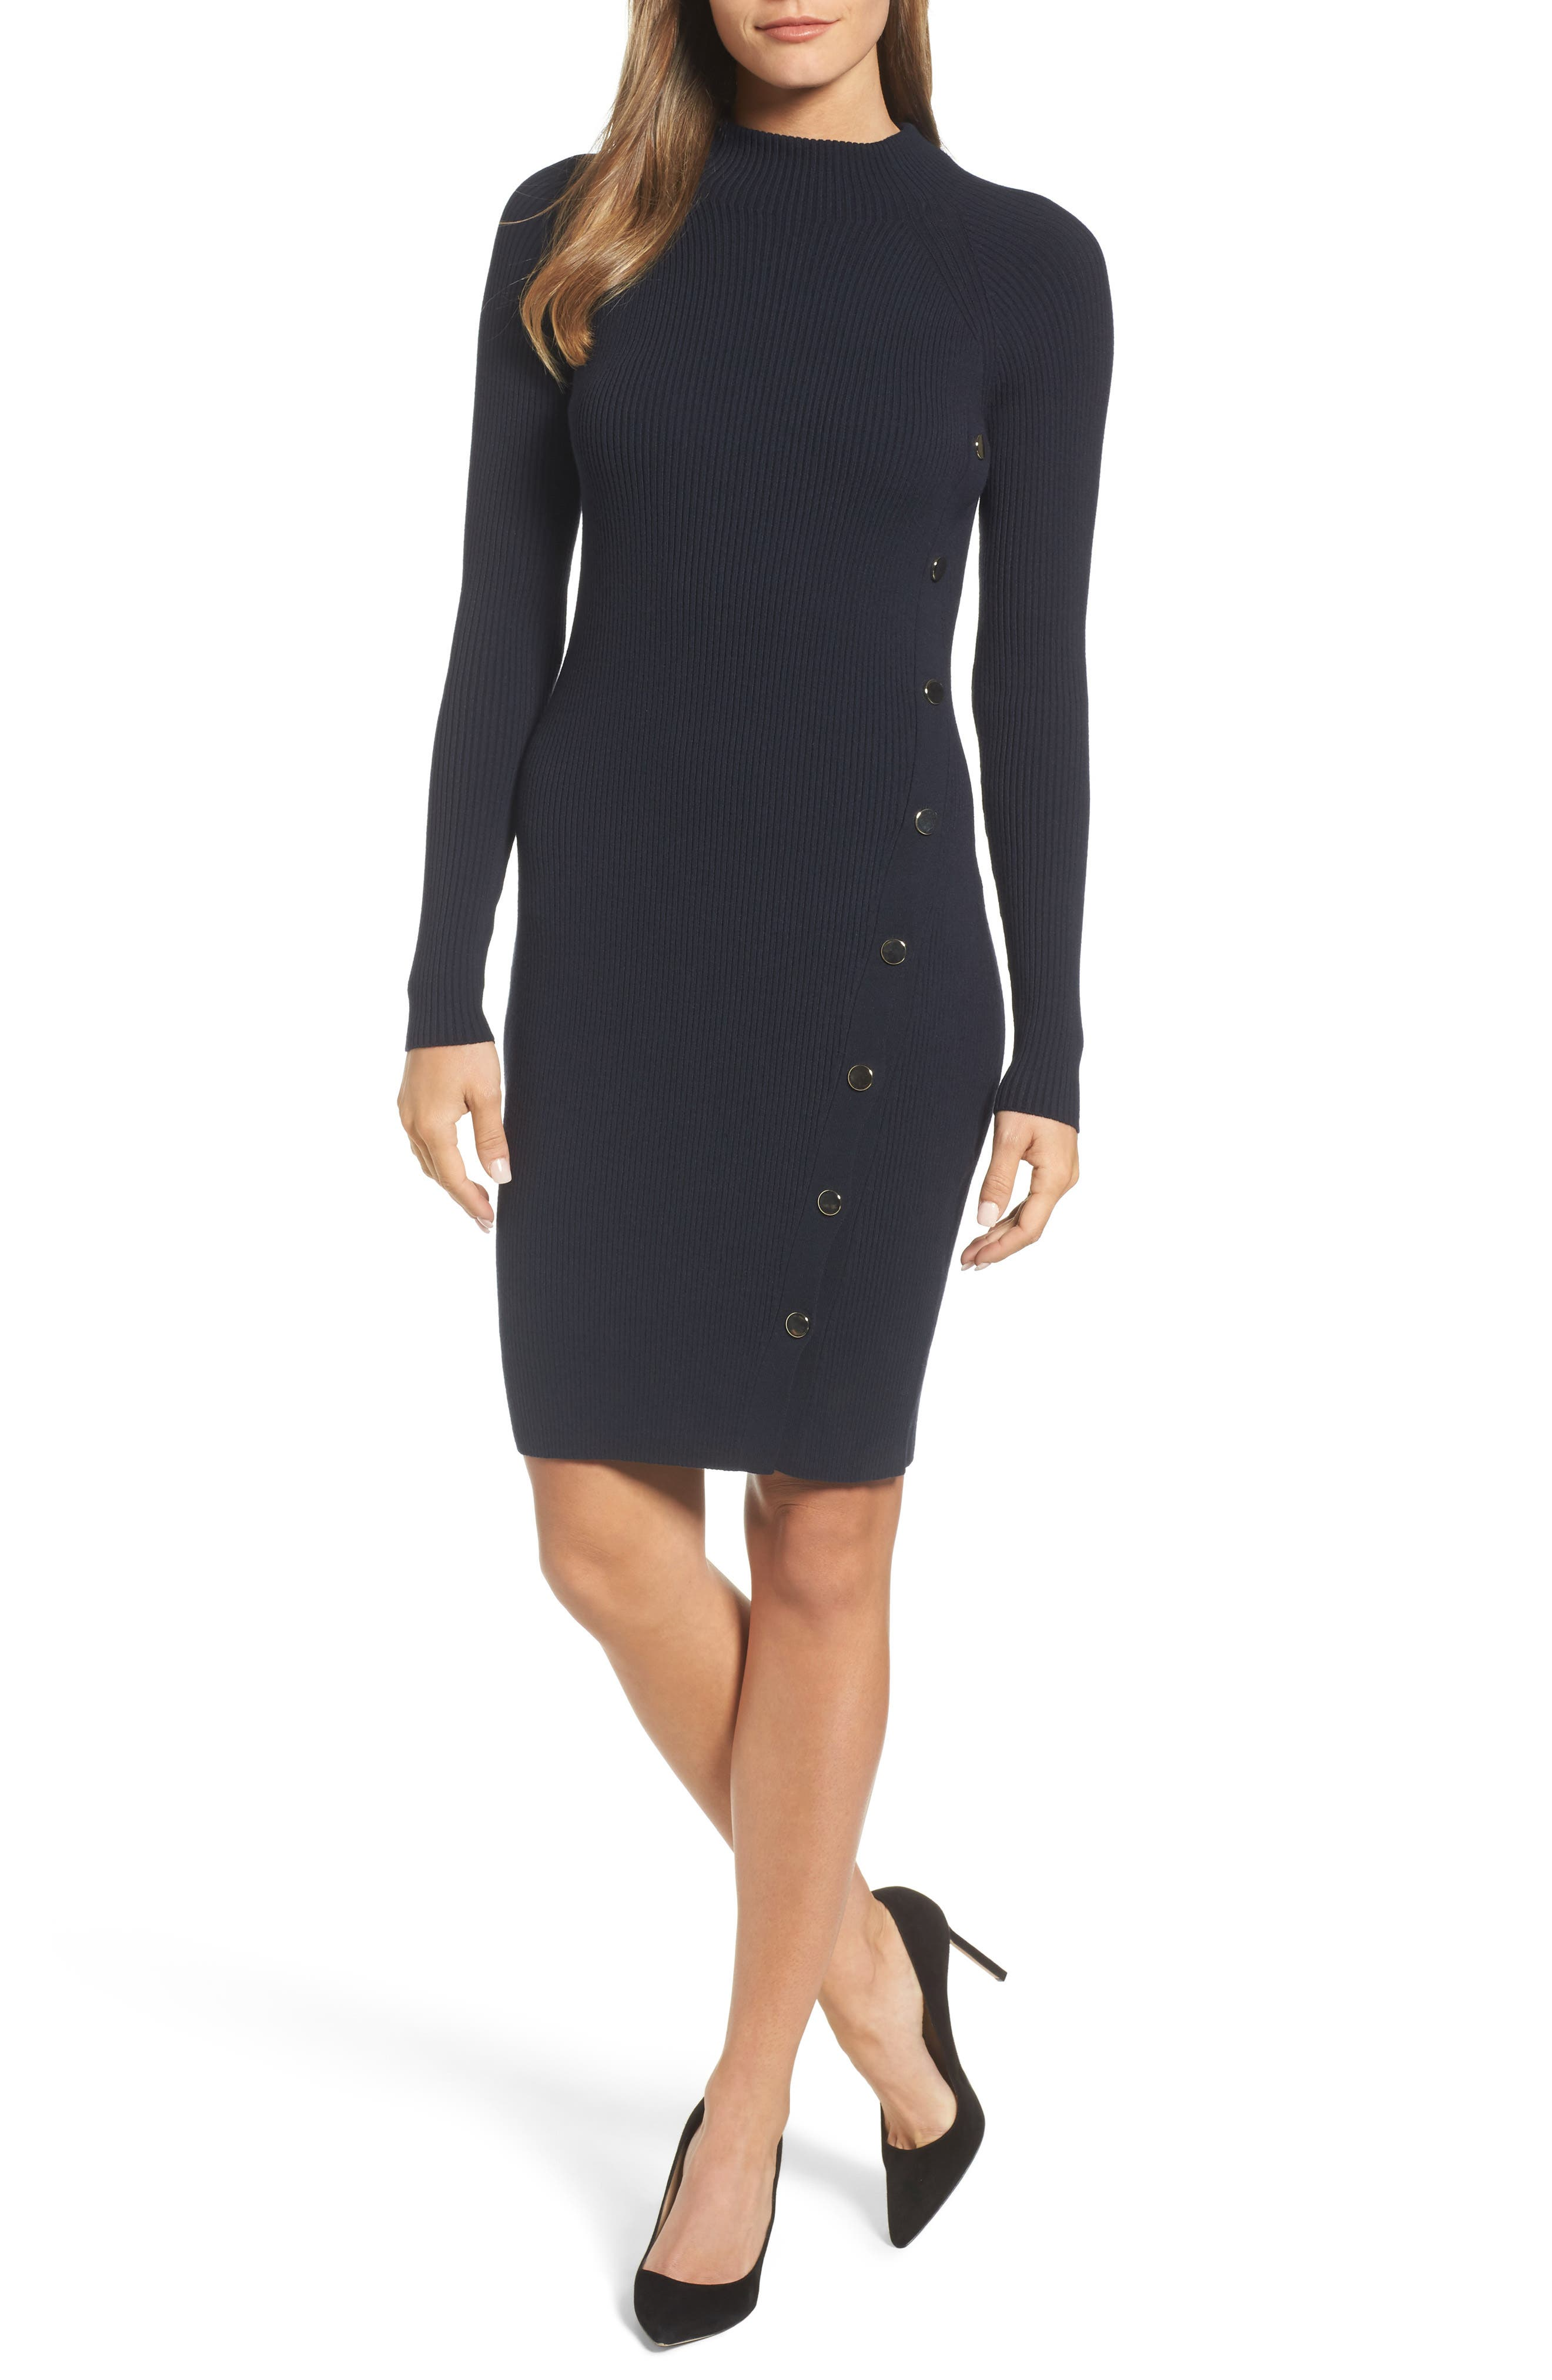 Farengi Sweater Dress,                             Main thumbnail 1, color,                             480